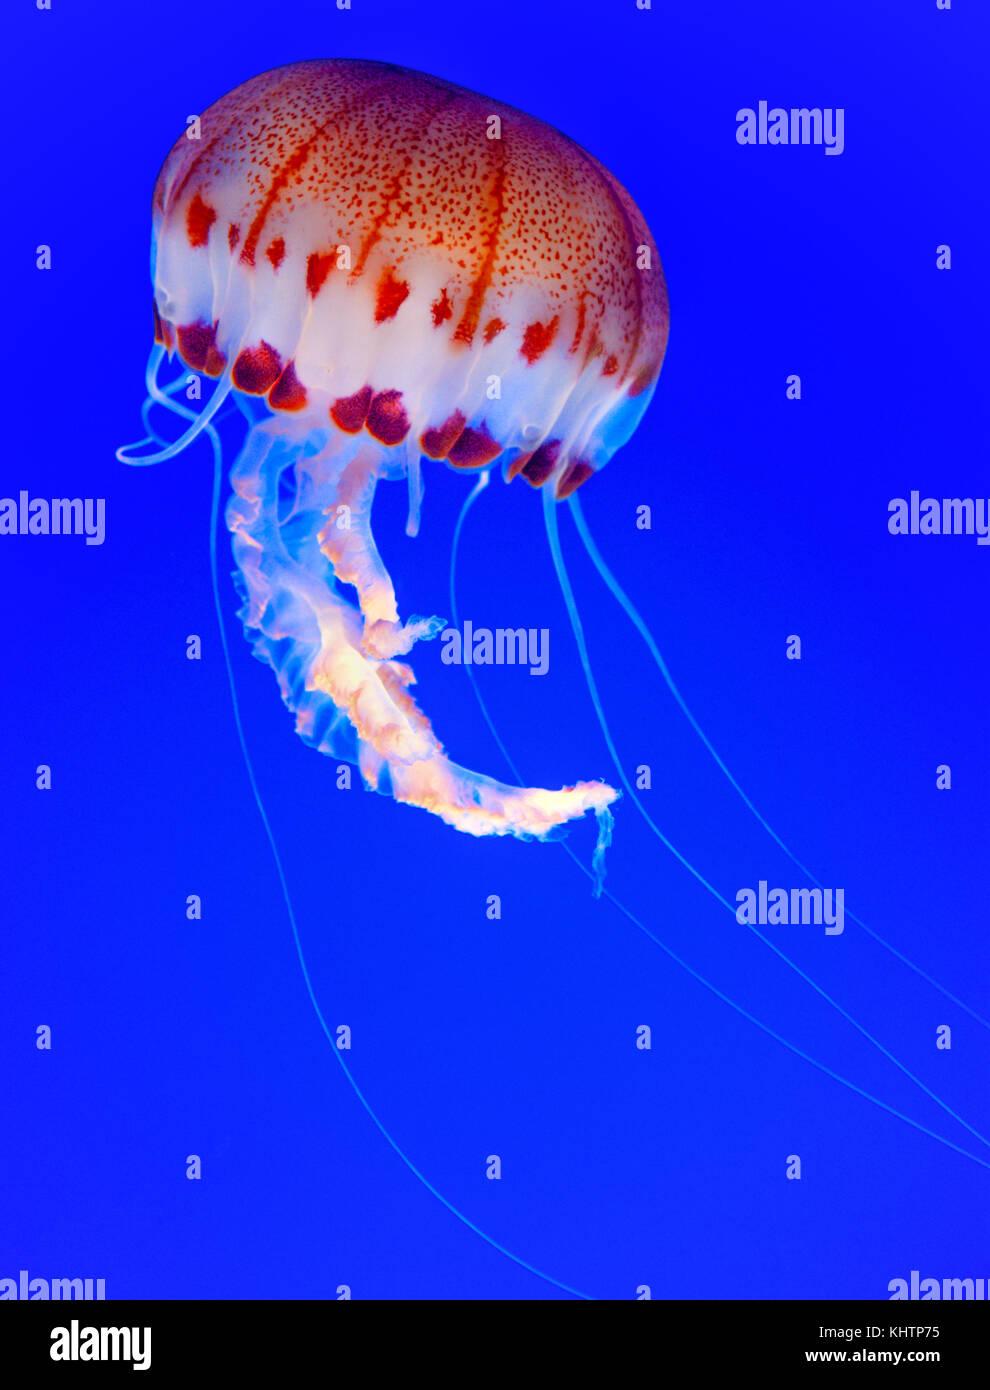 Un sorprendente jpurple-striped ellyfish (Chrysaora colorata) al Monterey Bay Aquarium, CA U.S.A. Immagini Stock